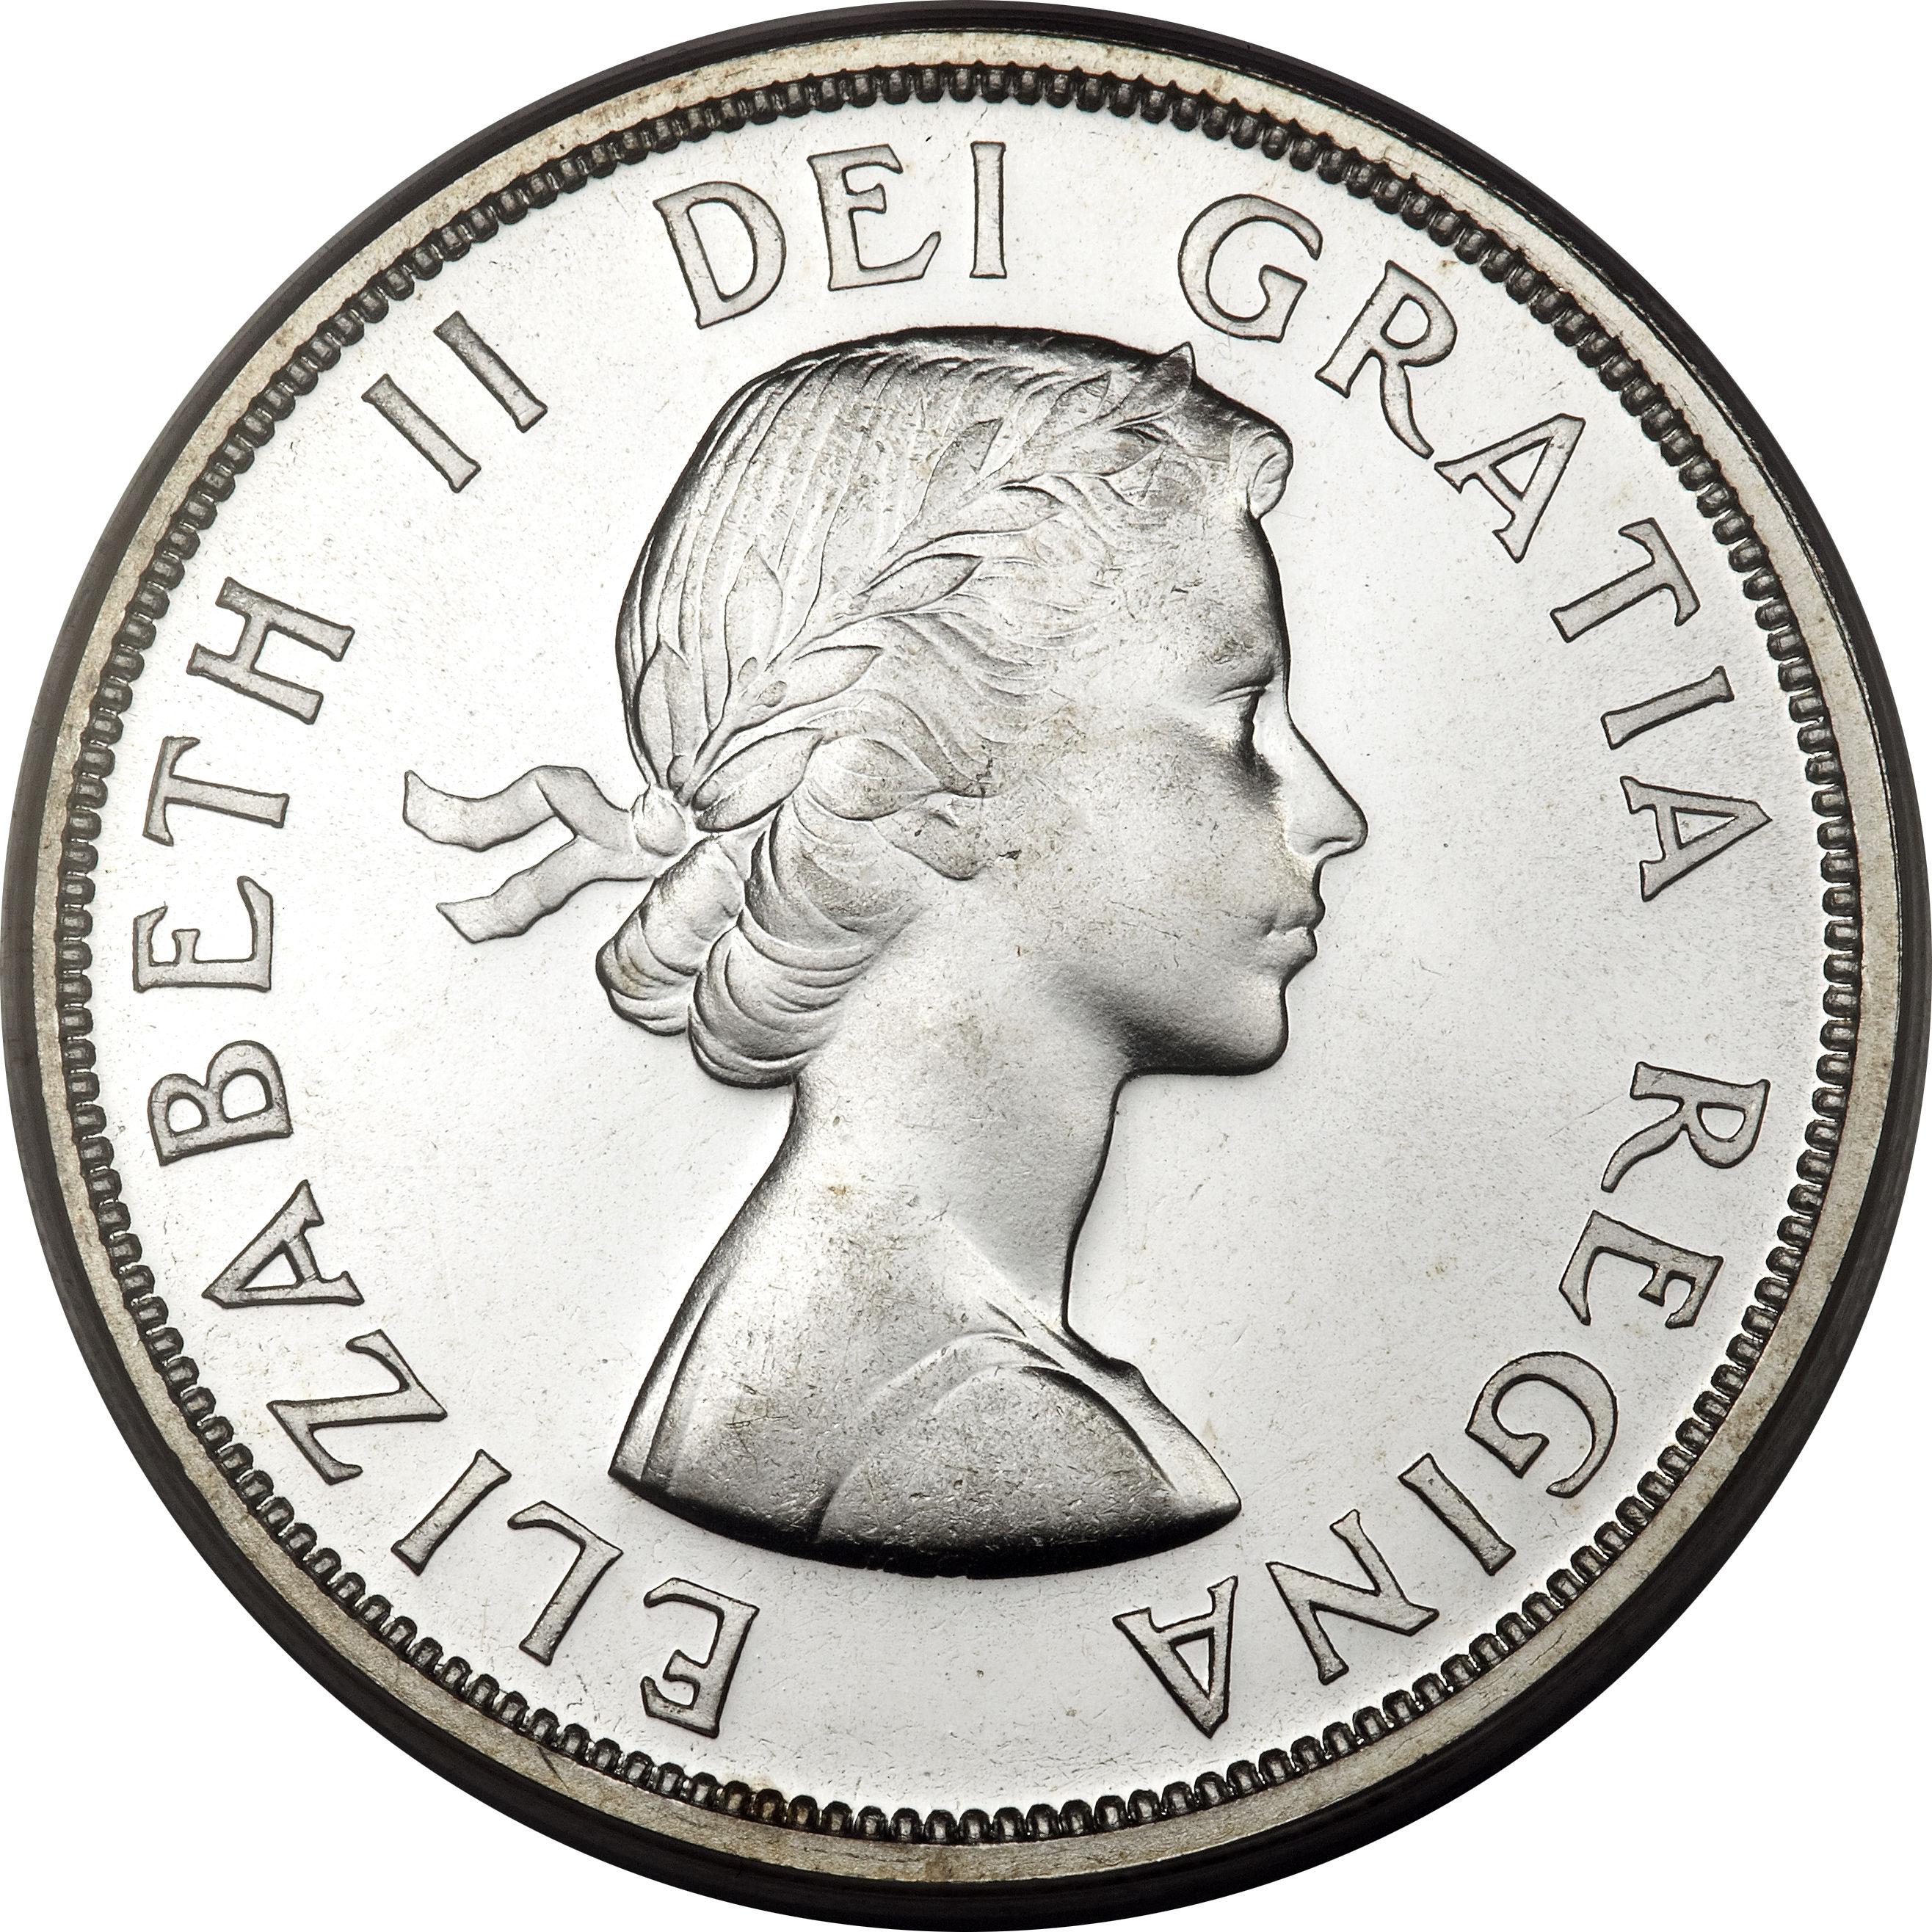 1 Dollar Elizabeth Ii 1st Portrait